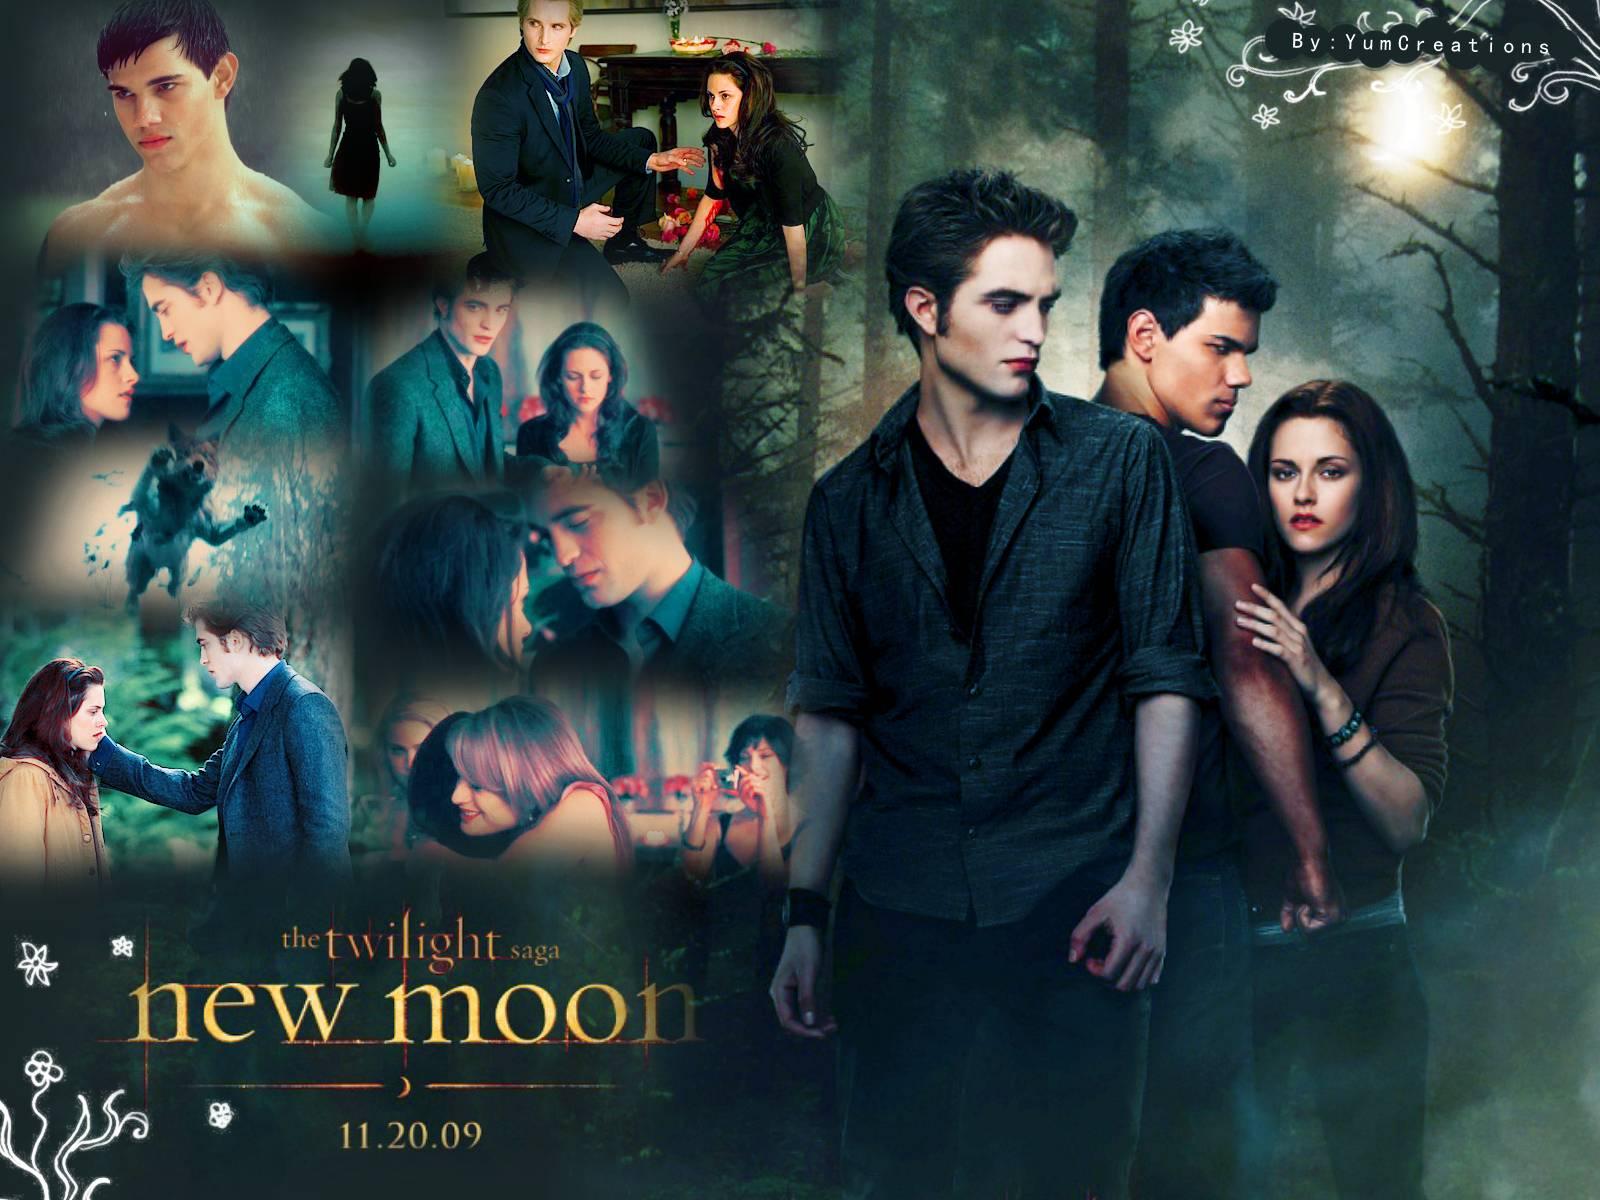 new moon full movie hd